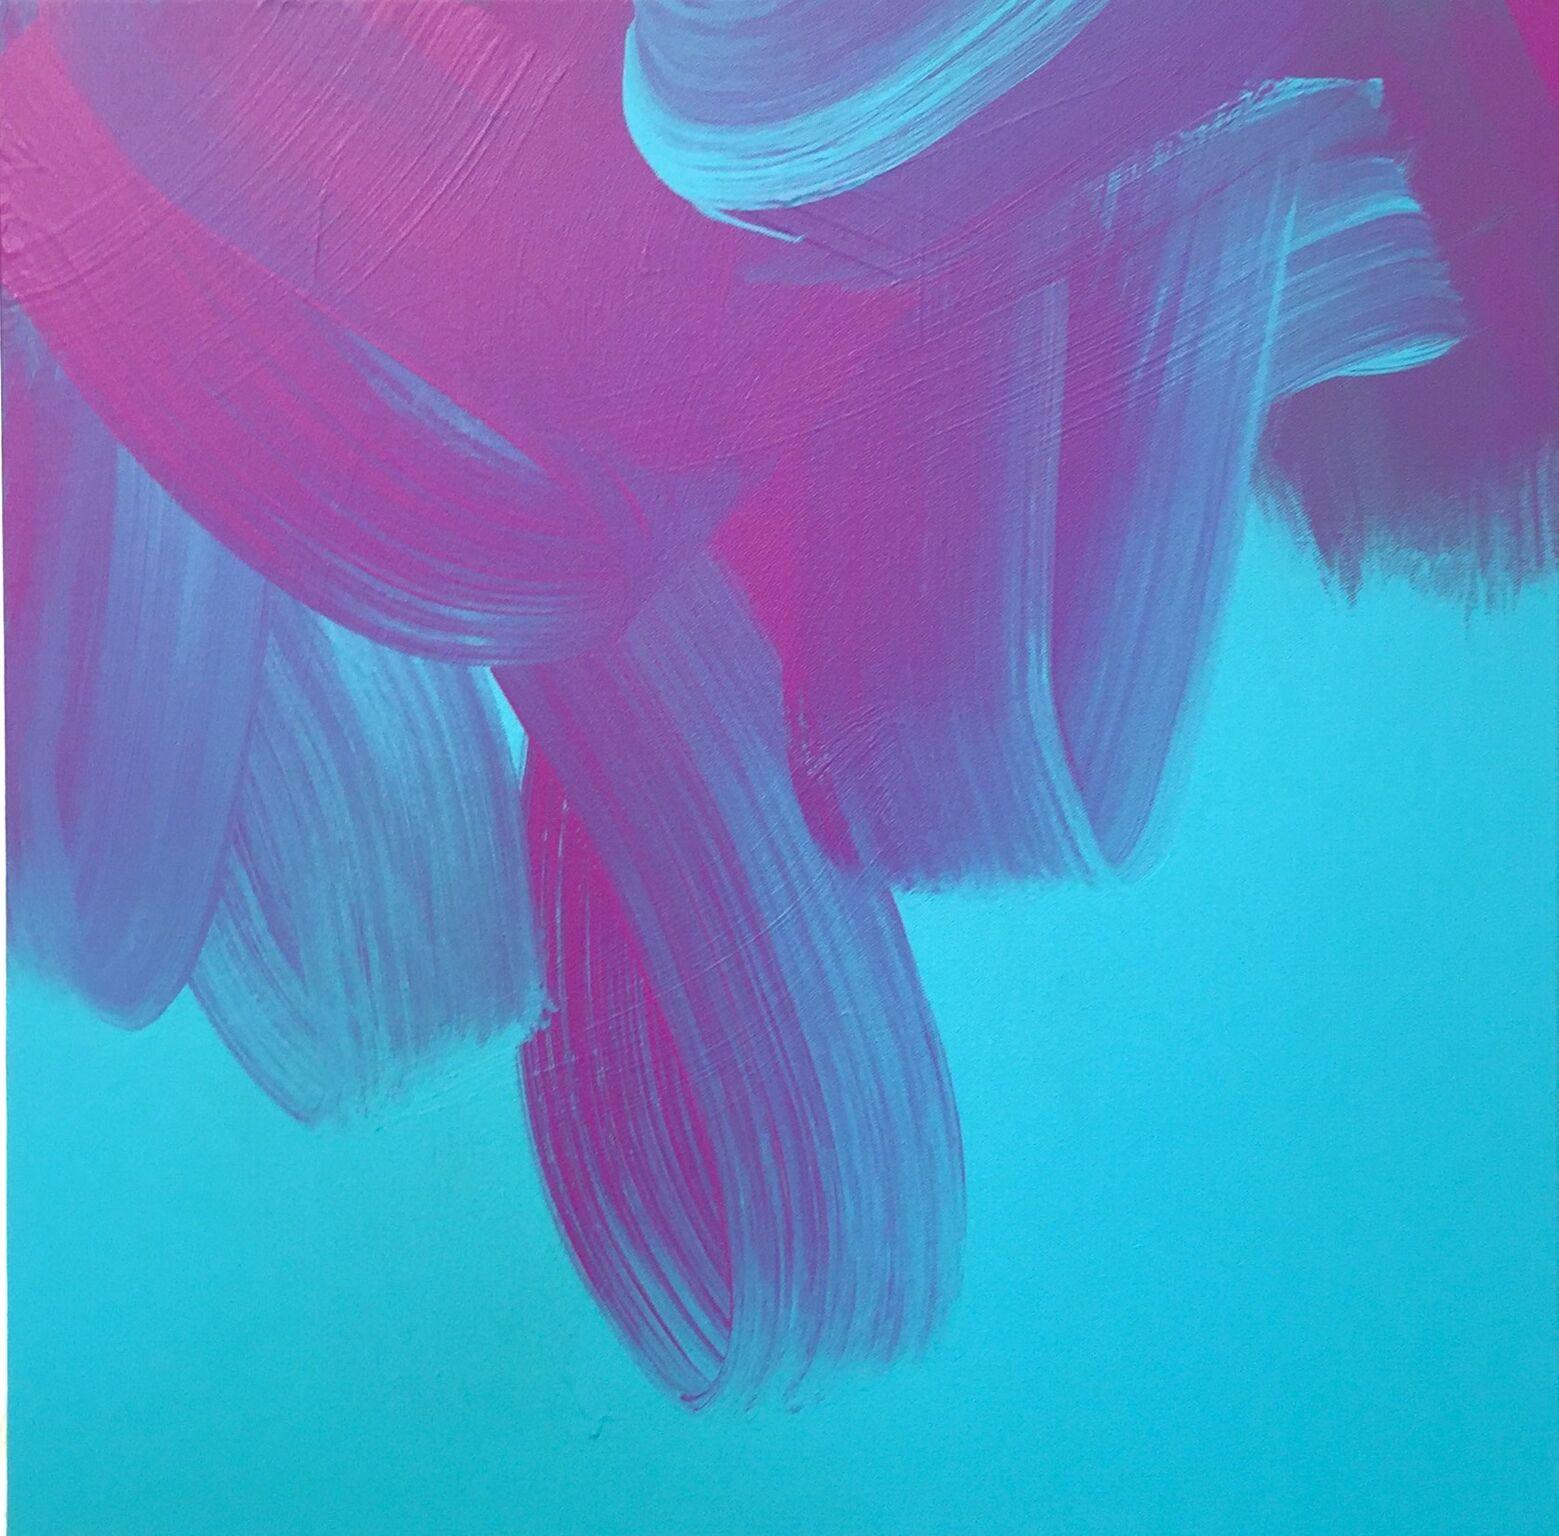 Jane Callister  Morning Sounds , 2017 Baroco-pop acrylic on canvas 24 x 24 in (61 x 61 cm)